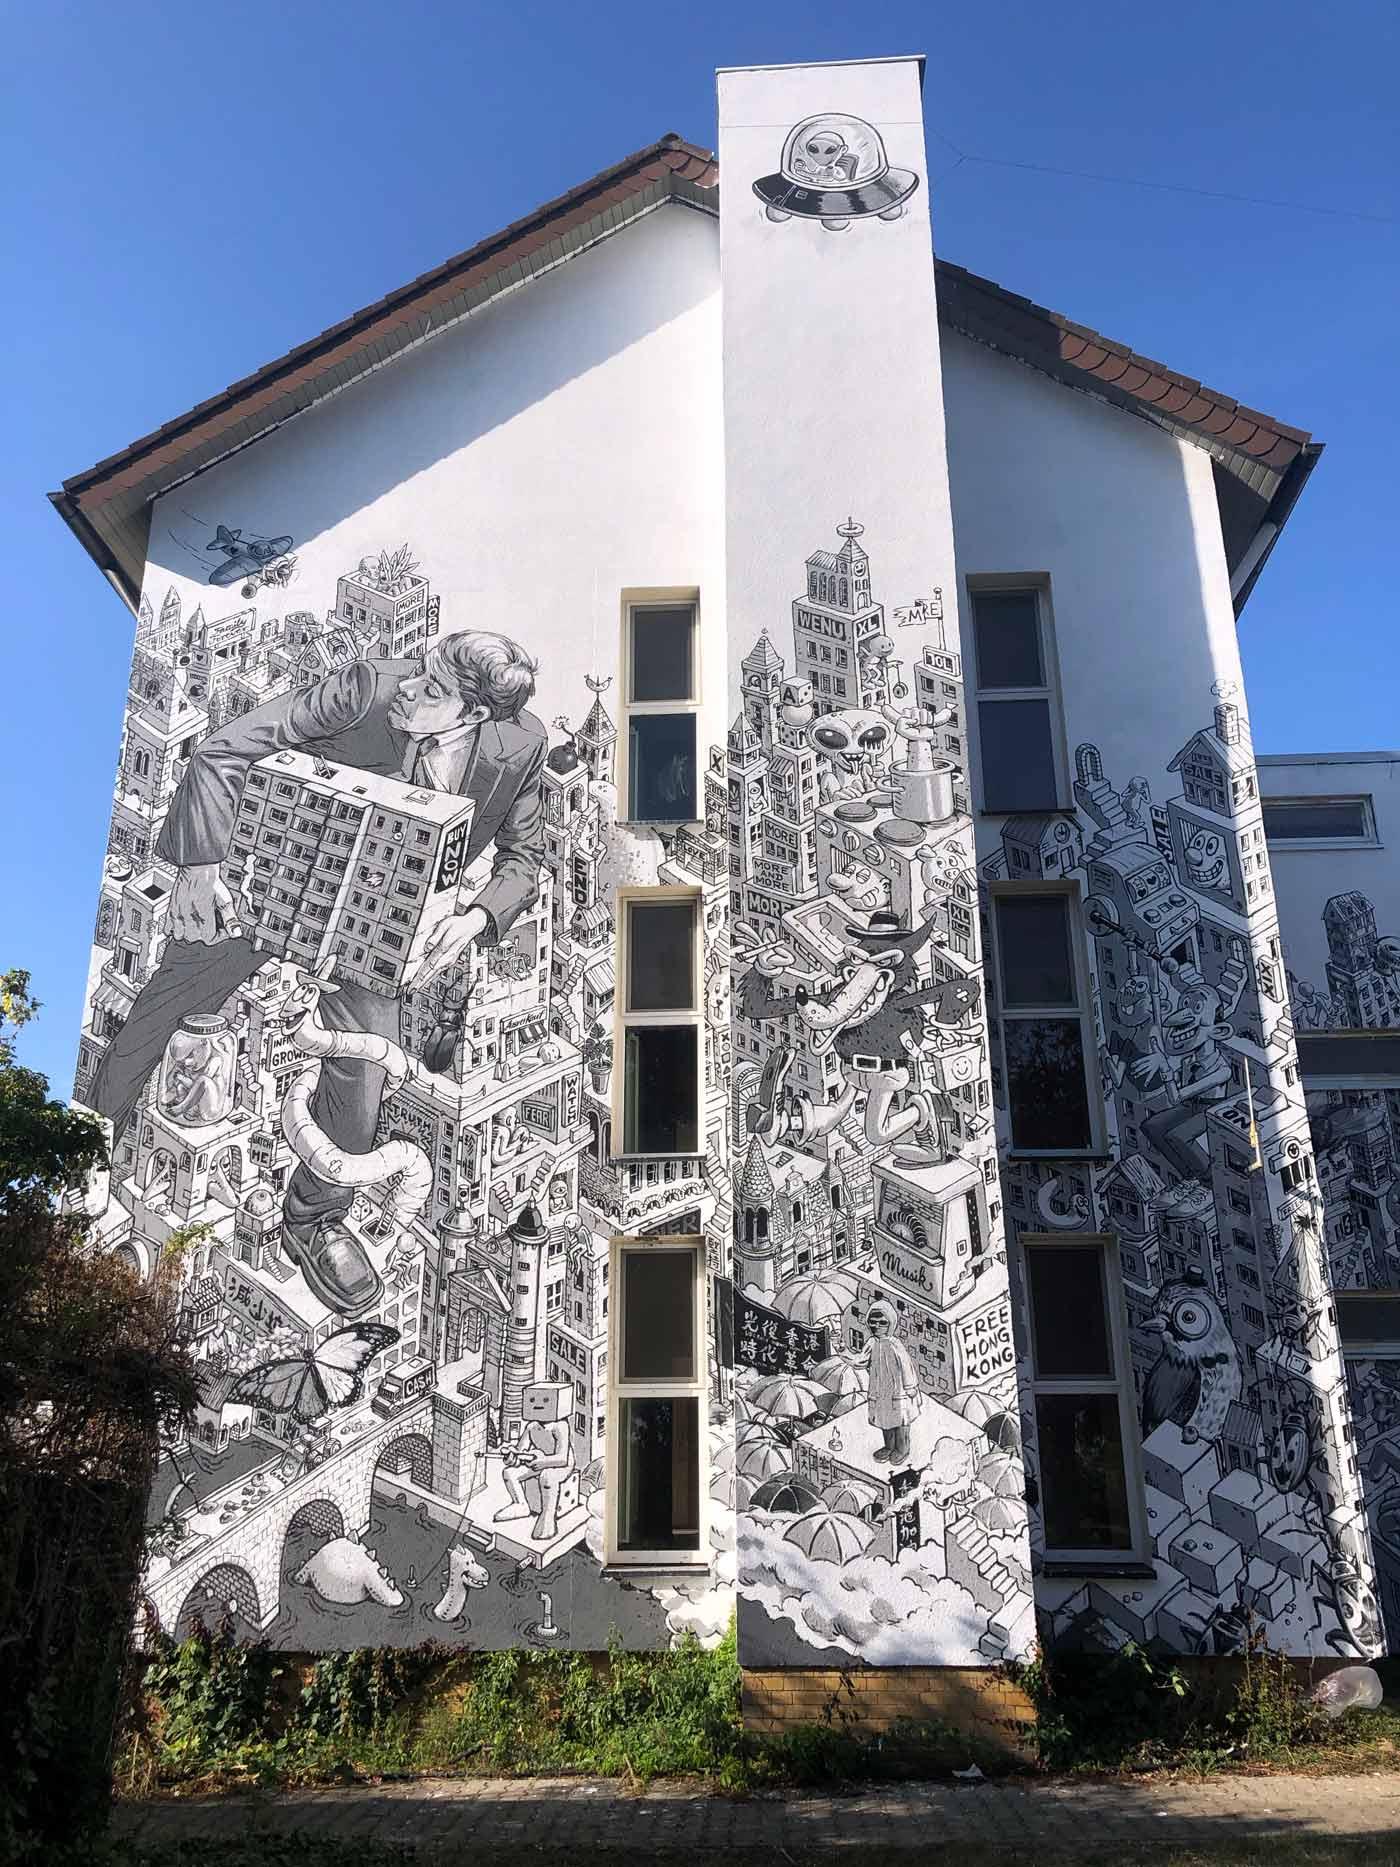 schwarz-weißes Graffiti an Hauswand